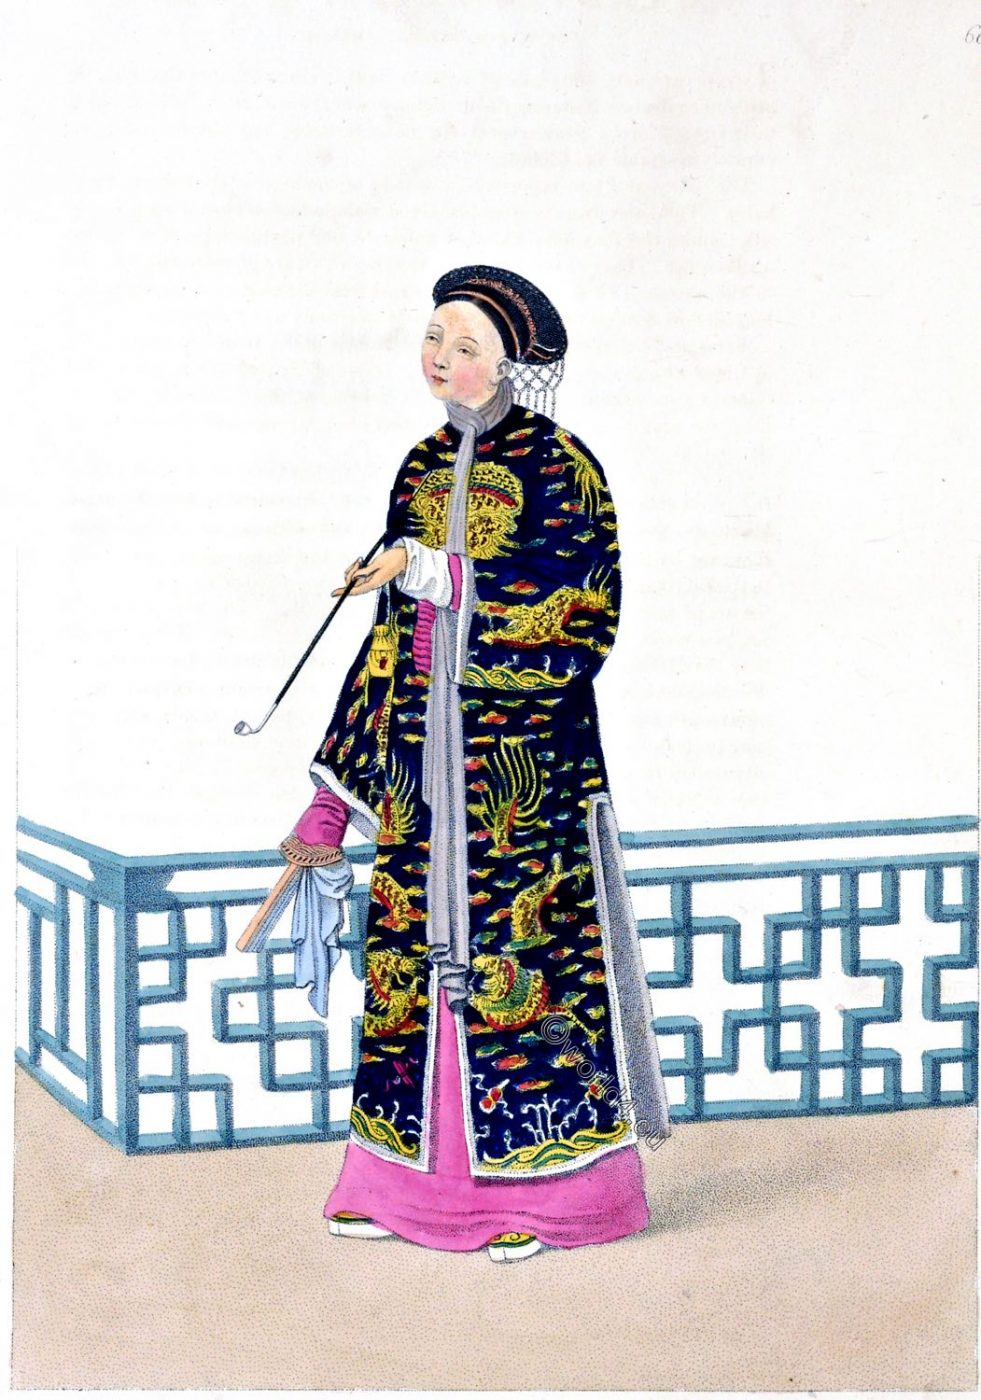 Chinese, lady, costume, ceremony, fashion, china, representation